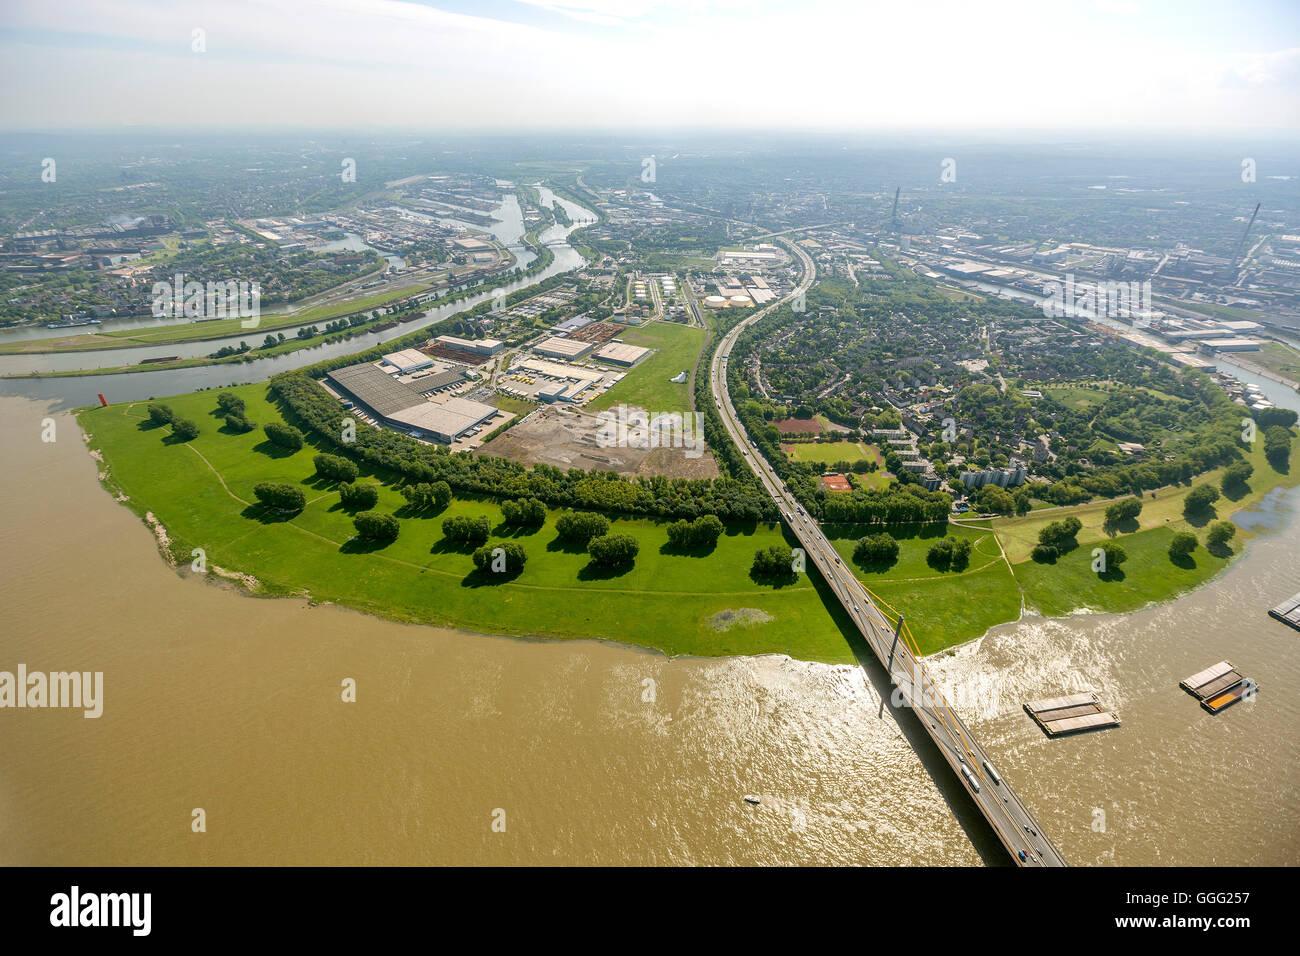 Germany, Europe, aerial photo, bird-eye view, aerial photo, aerial photo, aerial photography, Duisburg, Kassel field, - Stock Image